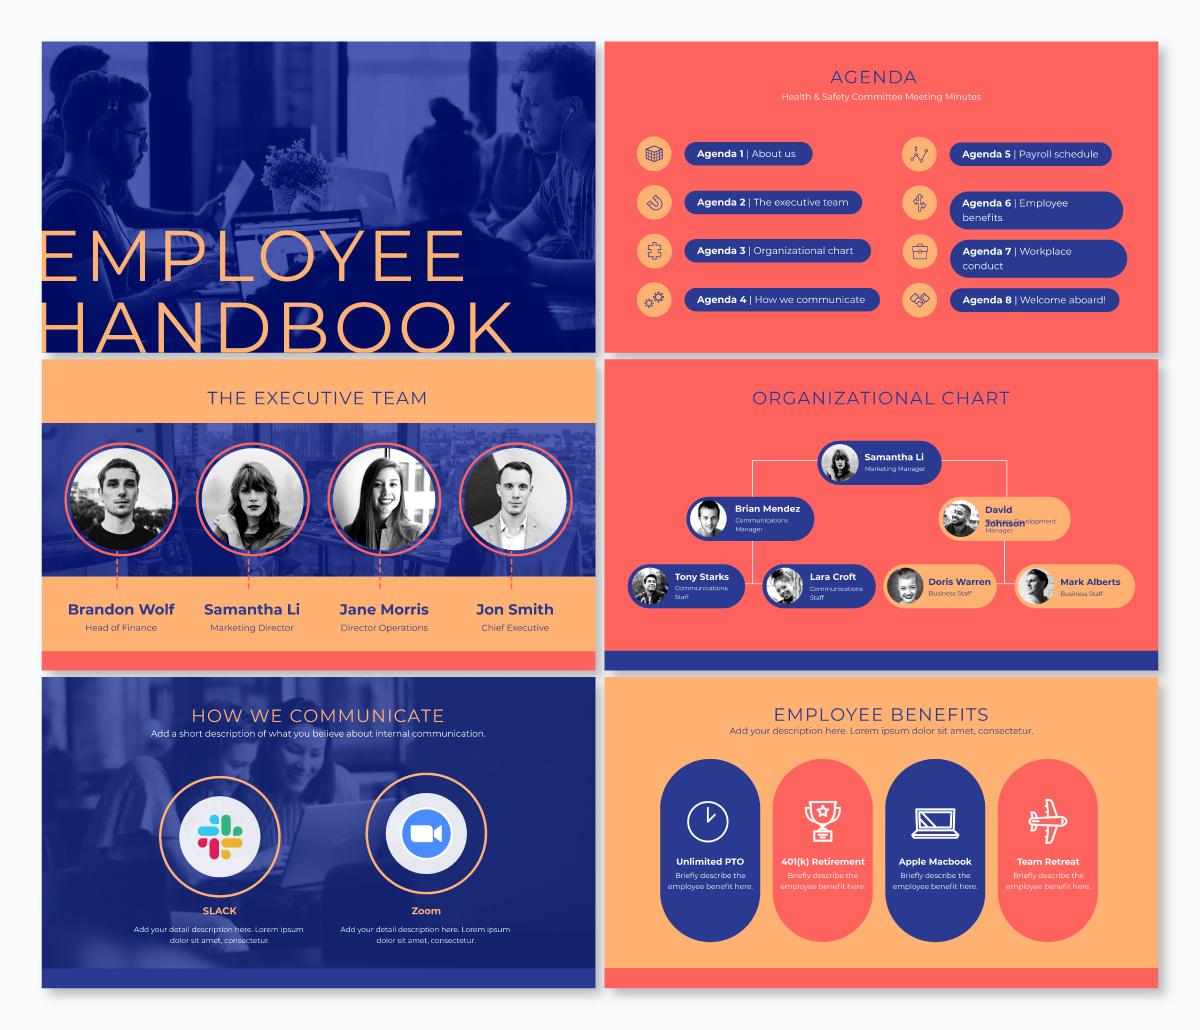 An employee handbook keynote template available in Visme.